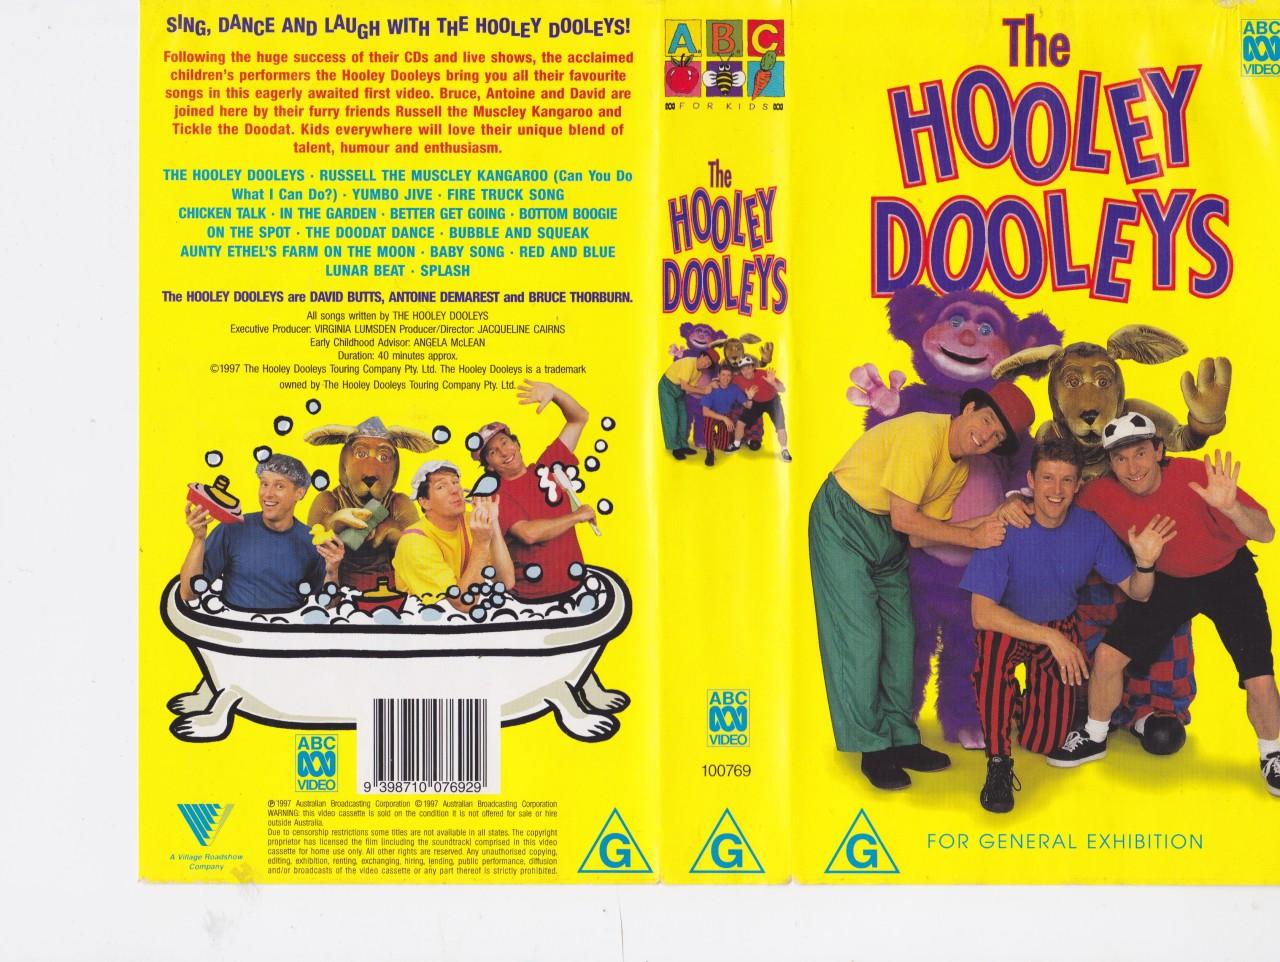 The Hooley Dooleys Videography